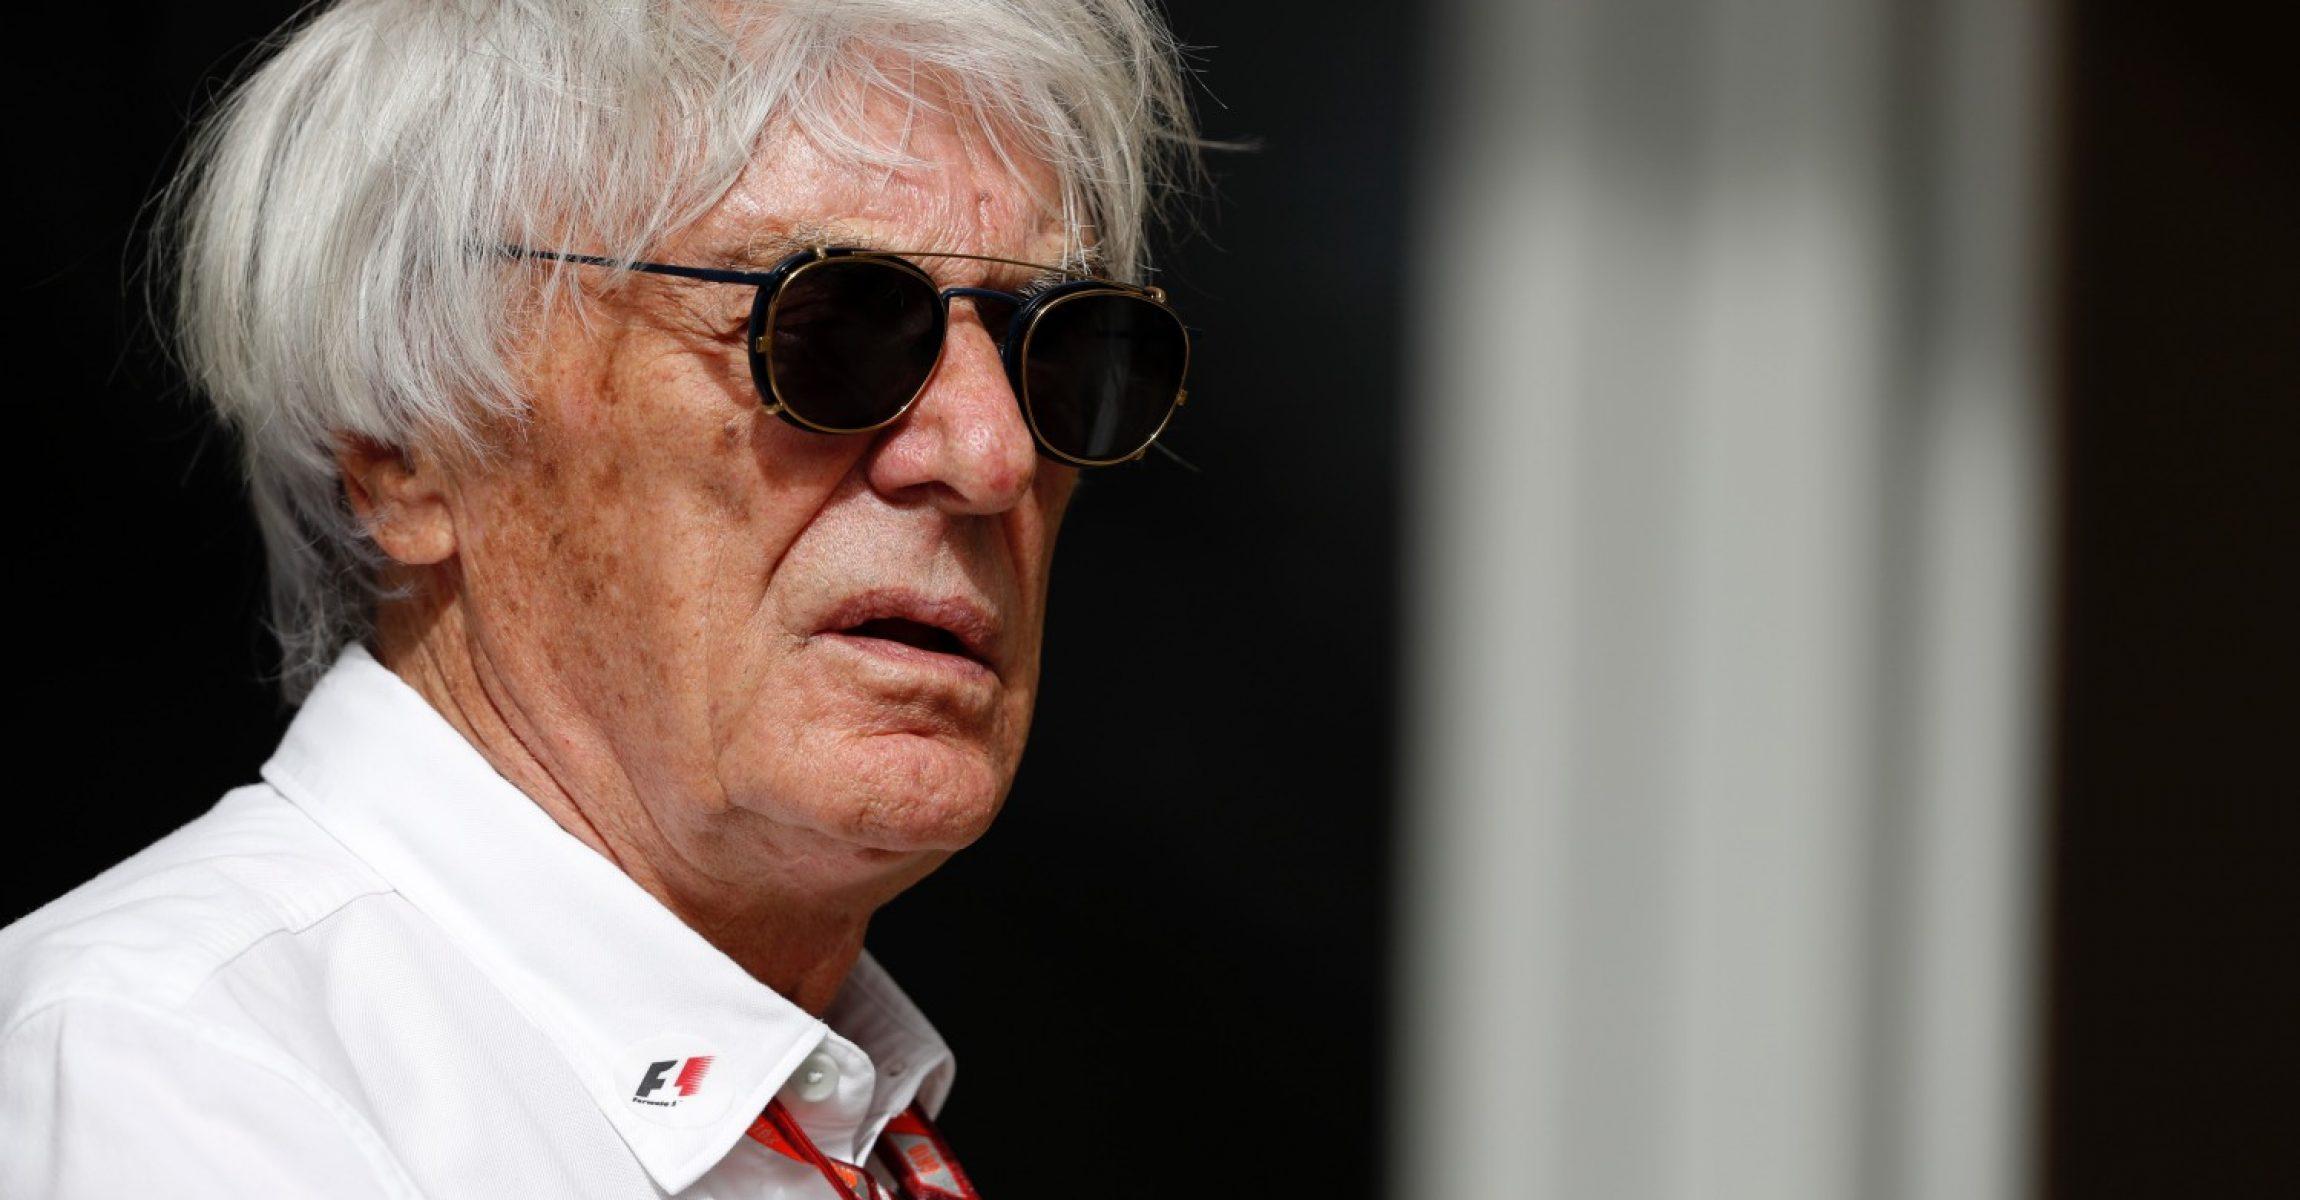 Bernie Ecclestone (GBR) at Formula One World Championship, Rd2, Bahrain Grand Prix, Race, Bahrain International Circuit, Sakhir, Bahrain, Sunday 8 April 2018.